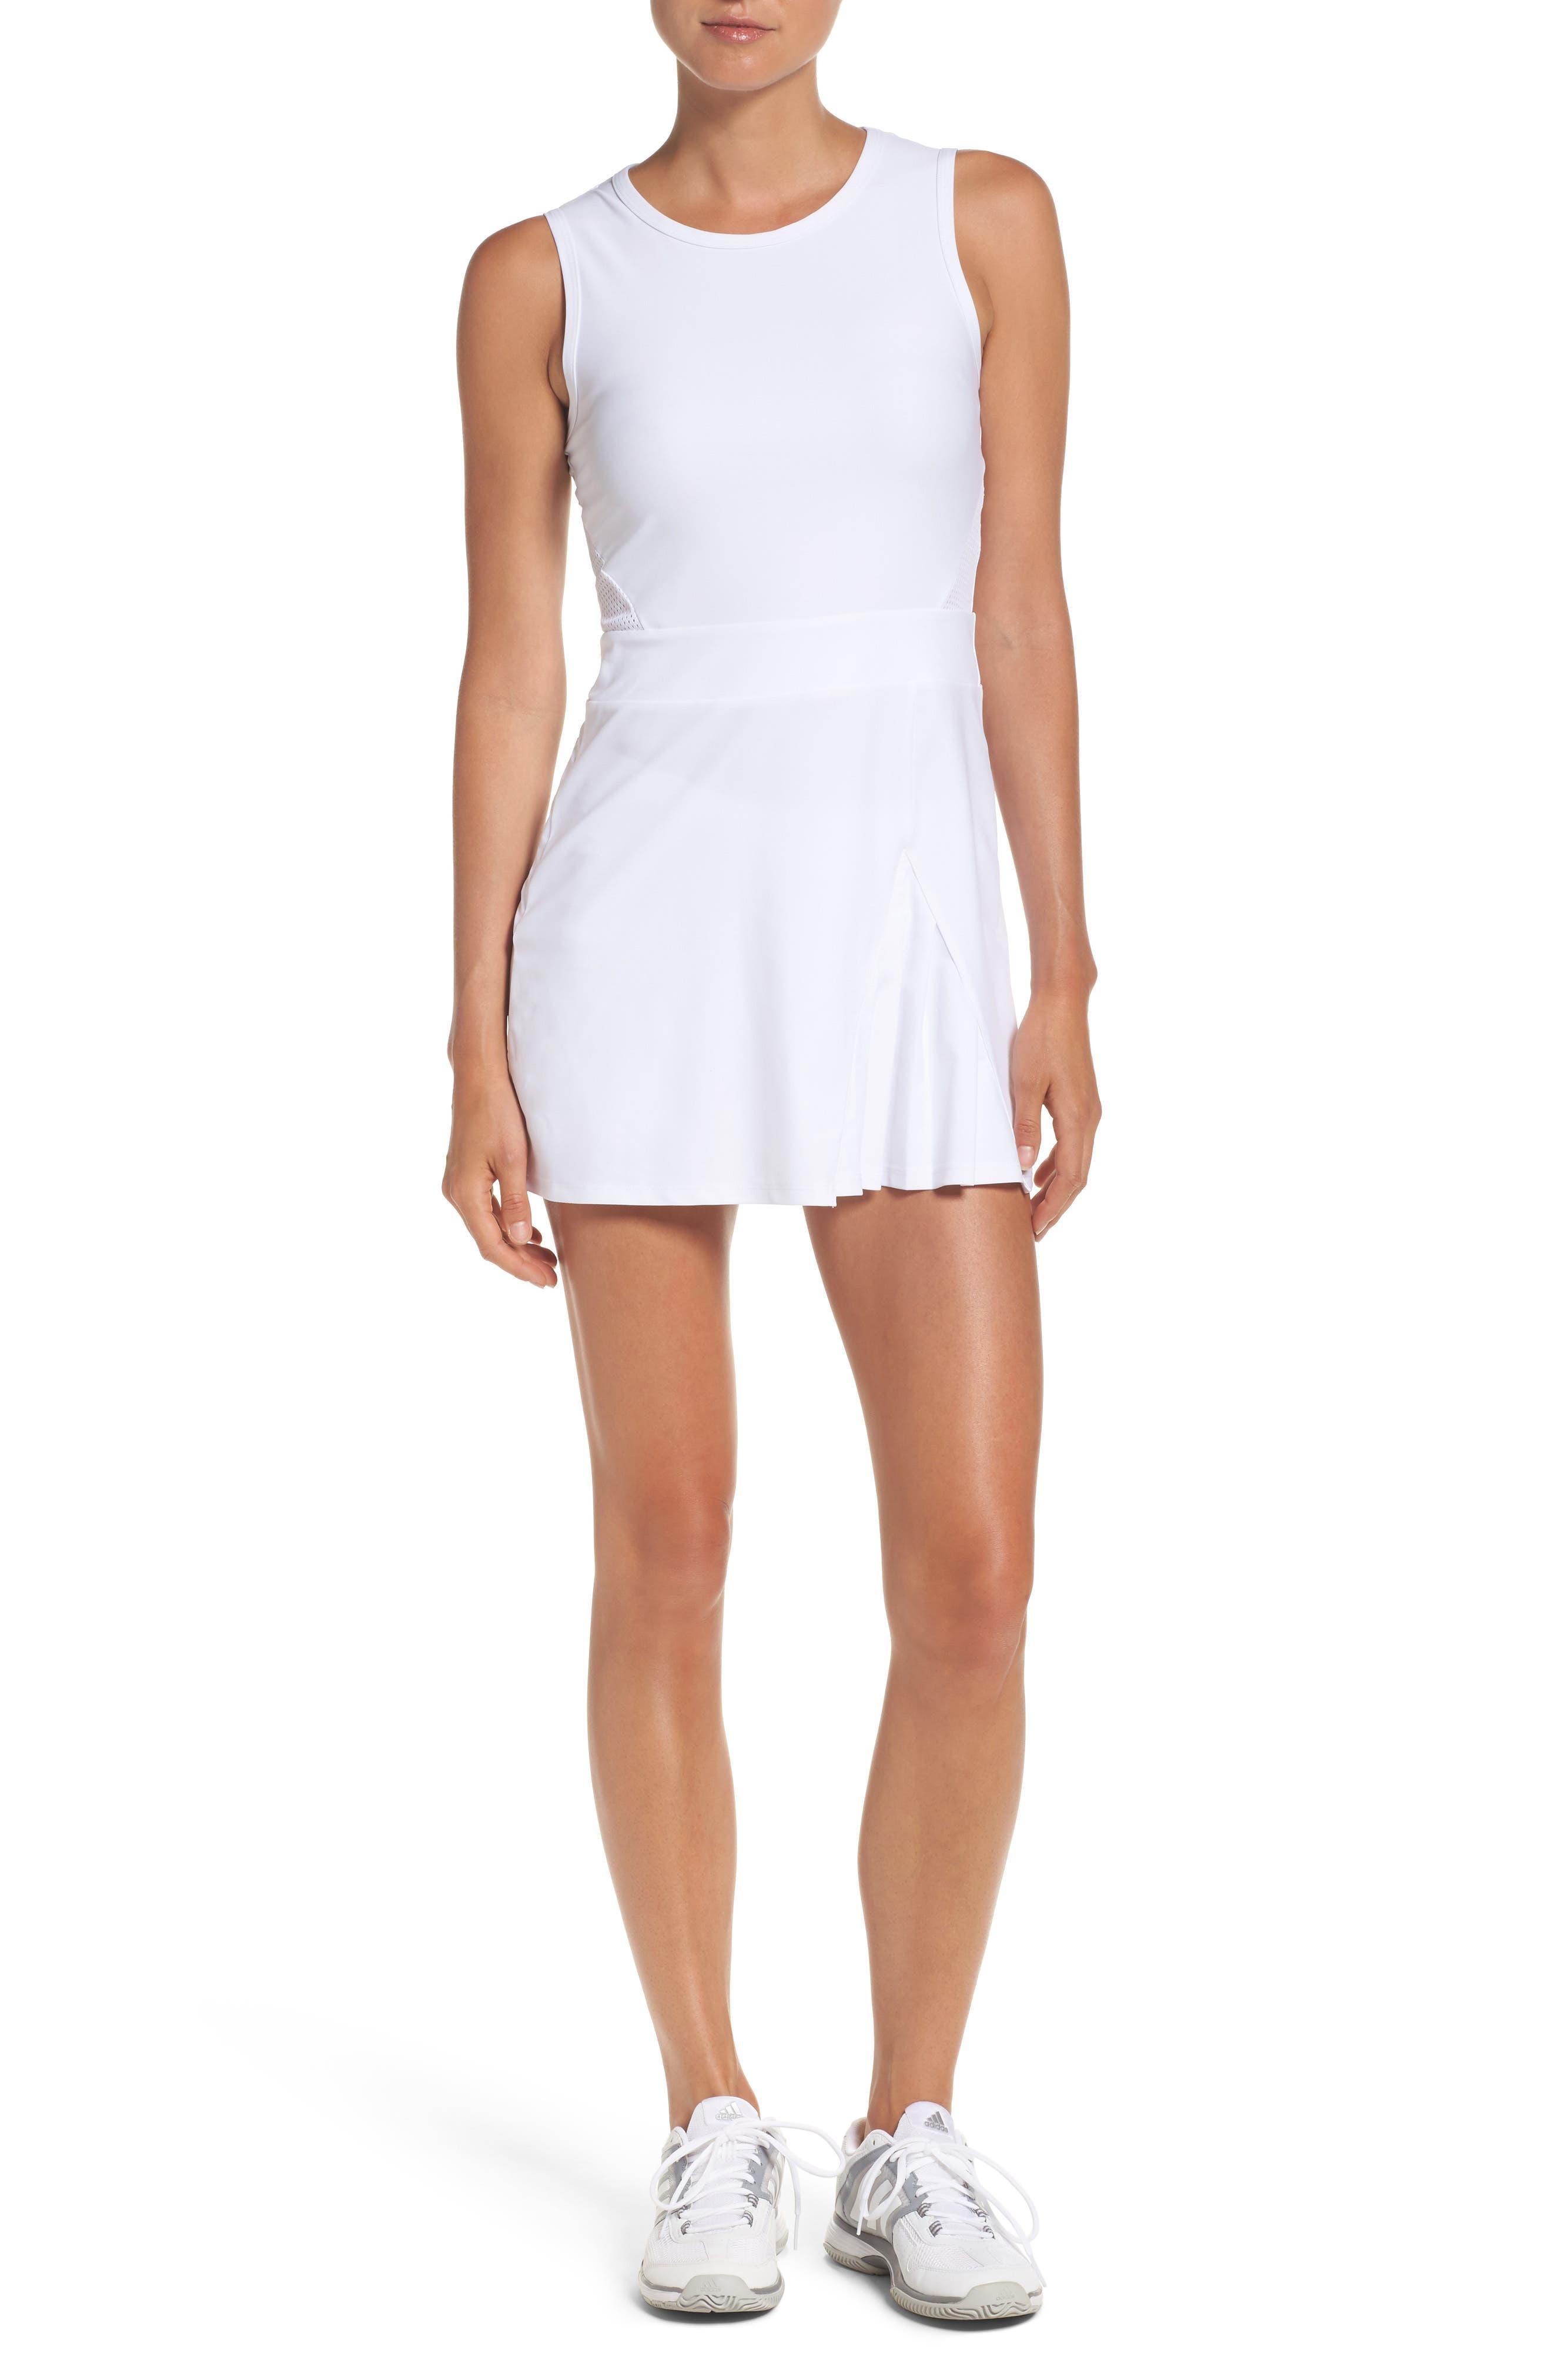 BoomBoom Athletica Tennis Dress & Shorts